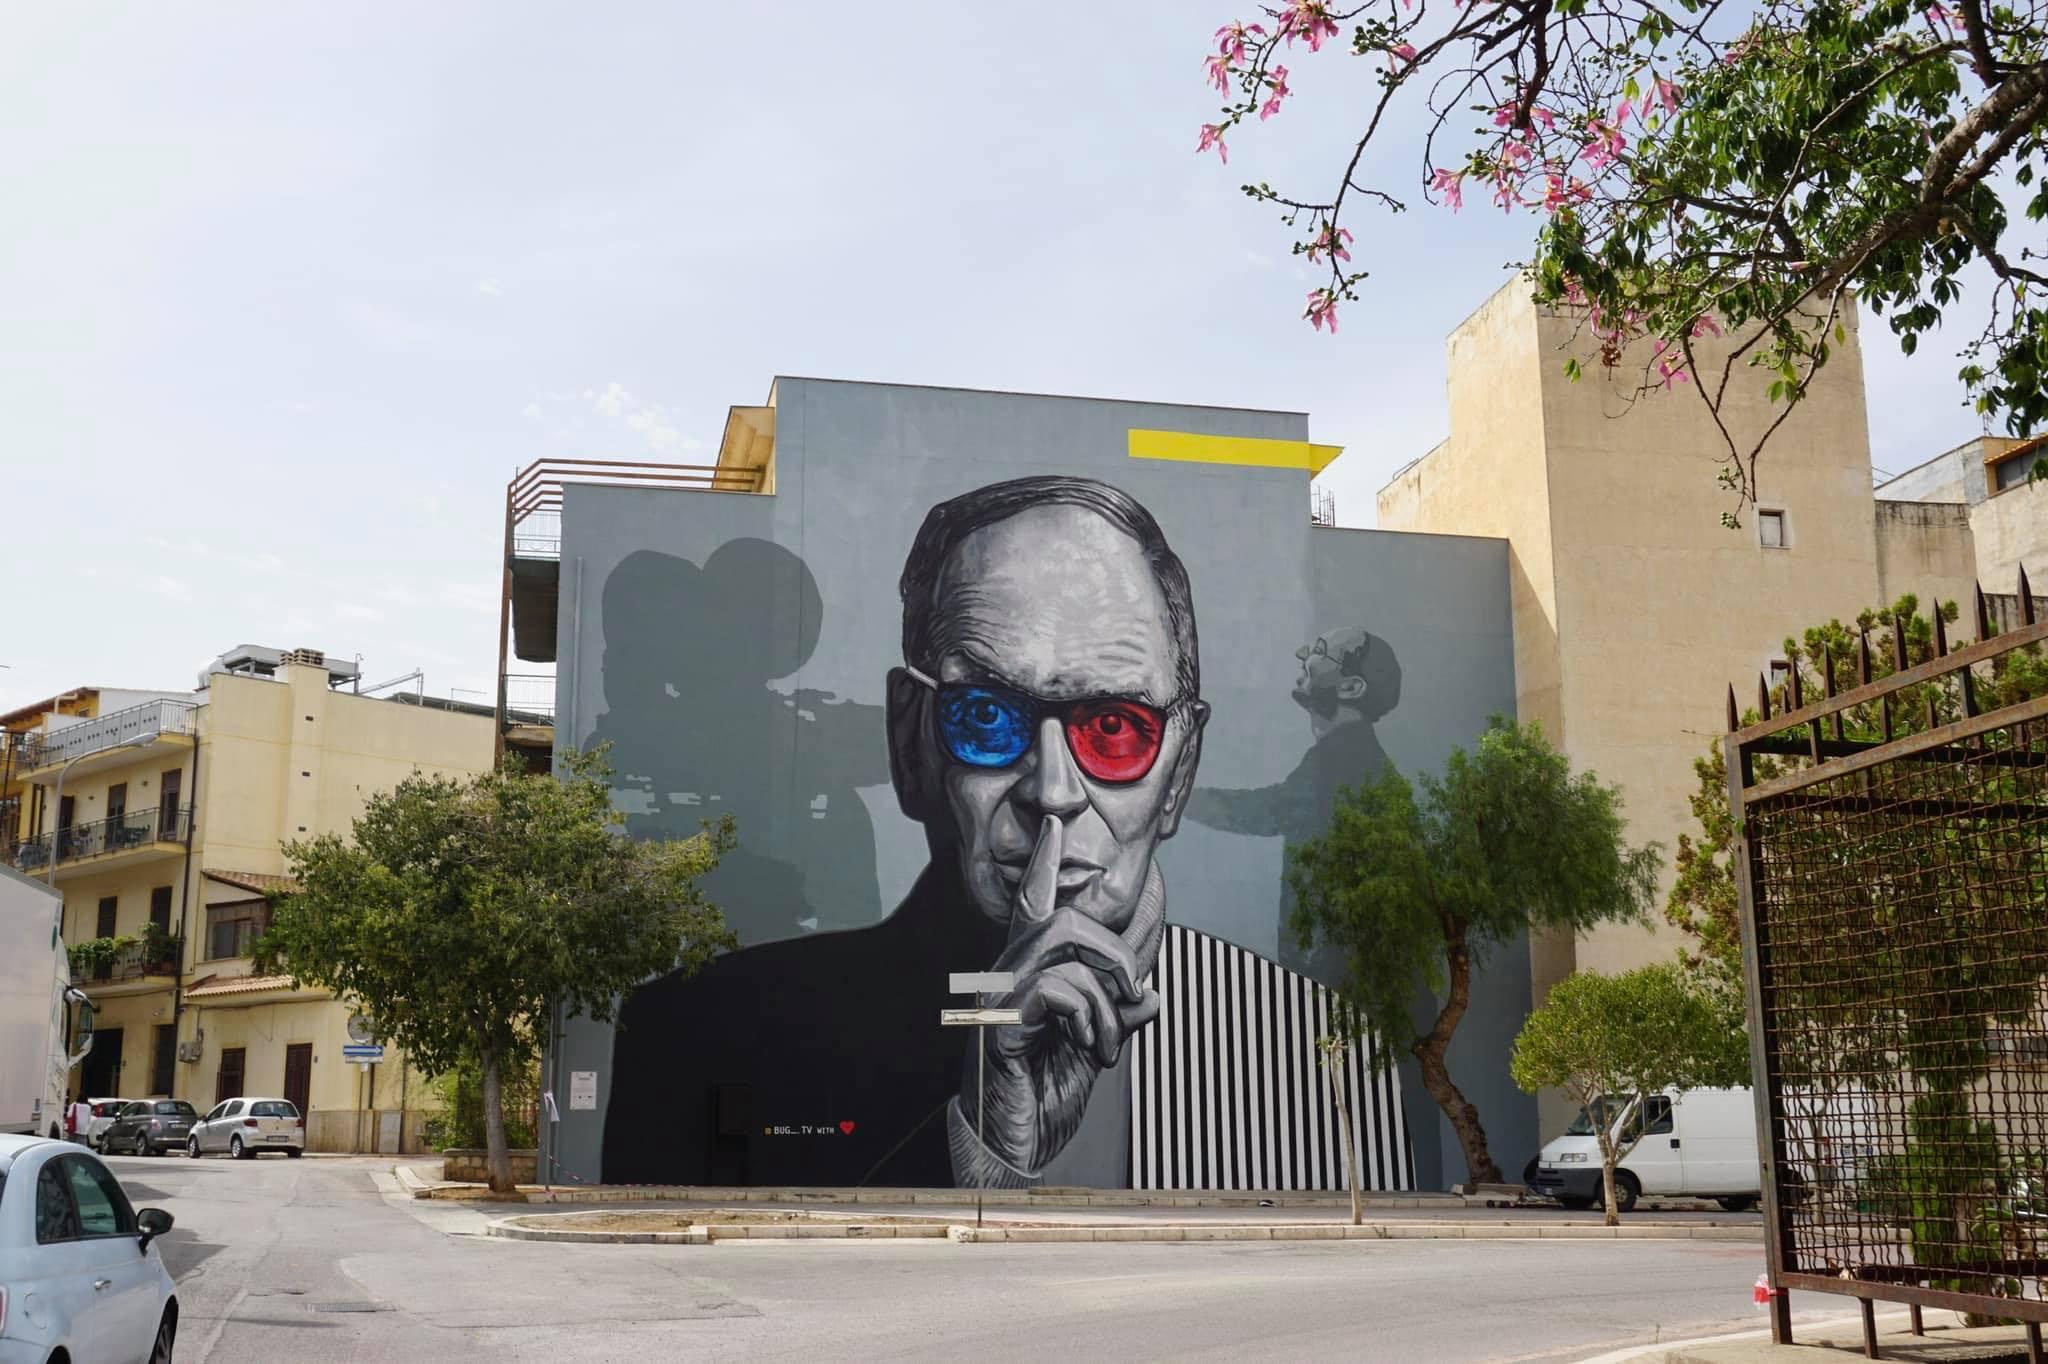 Street Art Cities inserisce Bagheria tra le mete più cool della street art mondiale